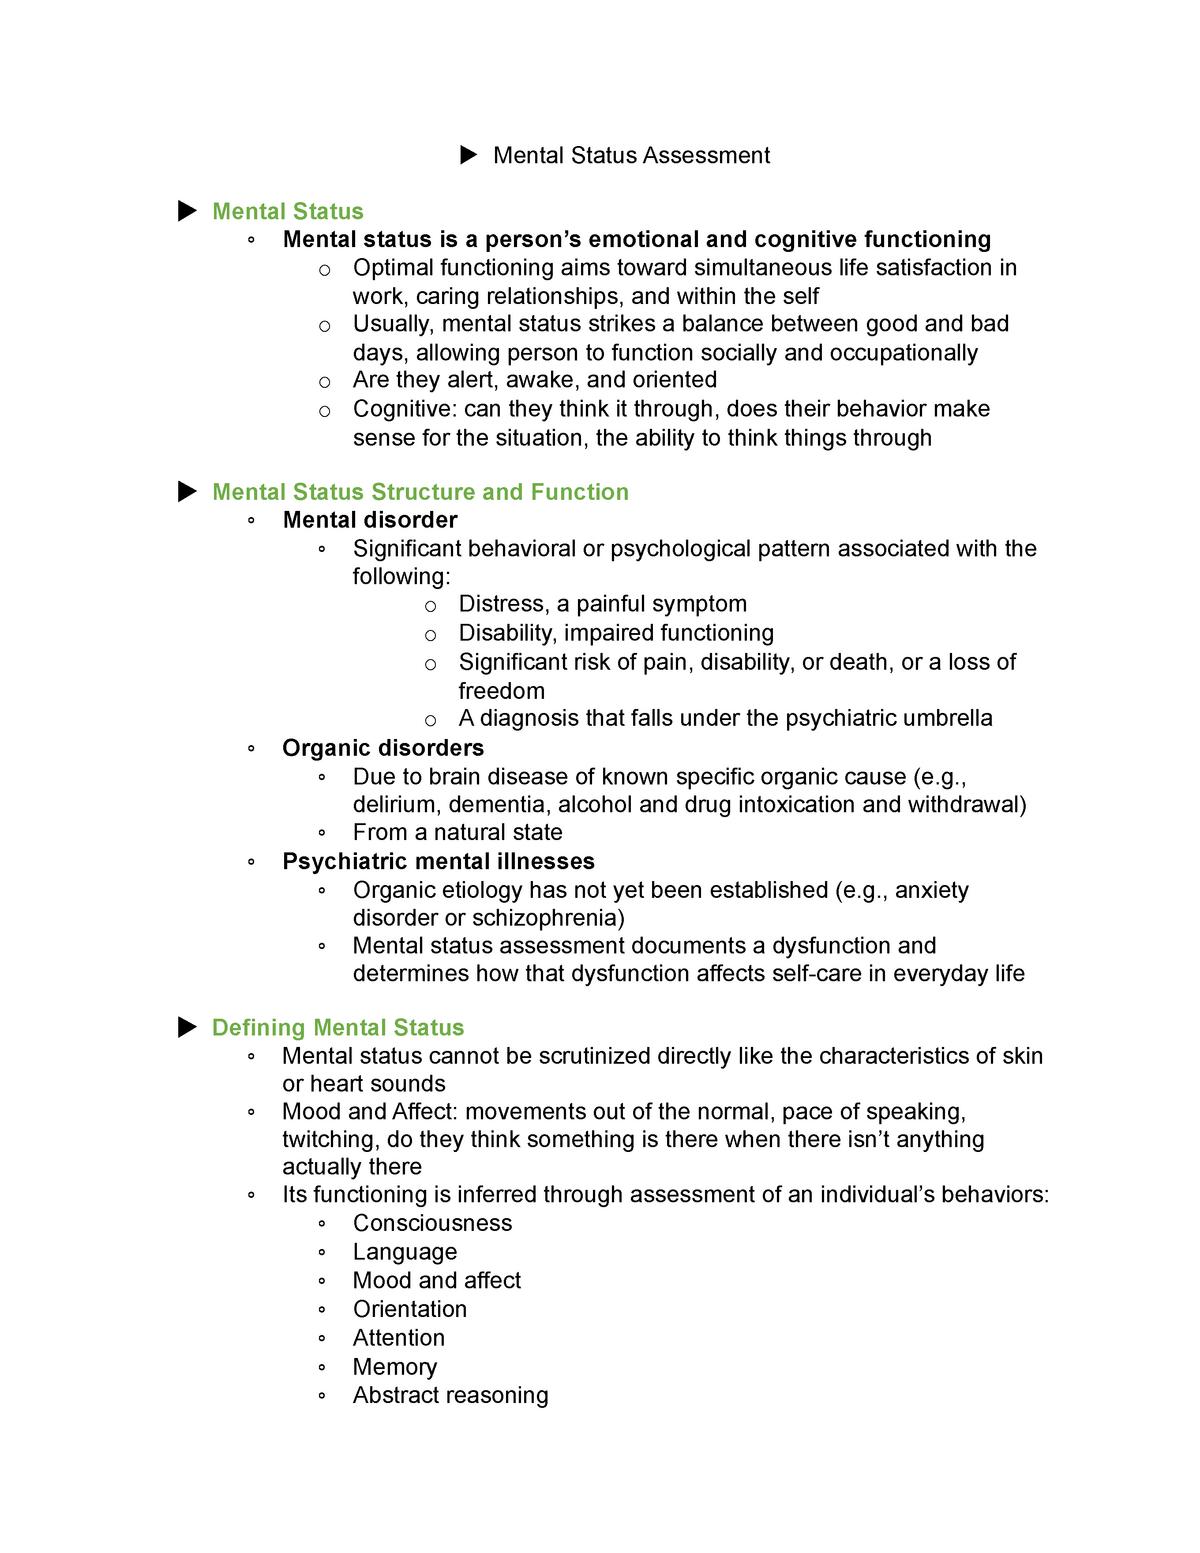 Mental Status Assessment Nur 3030 Nsu Studocu